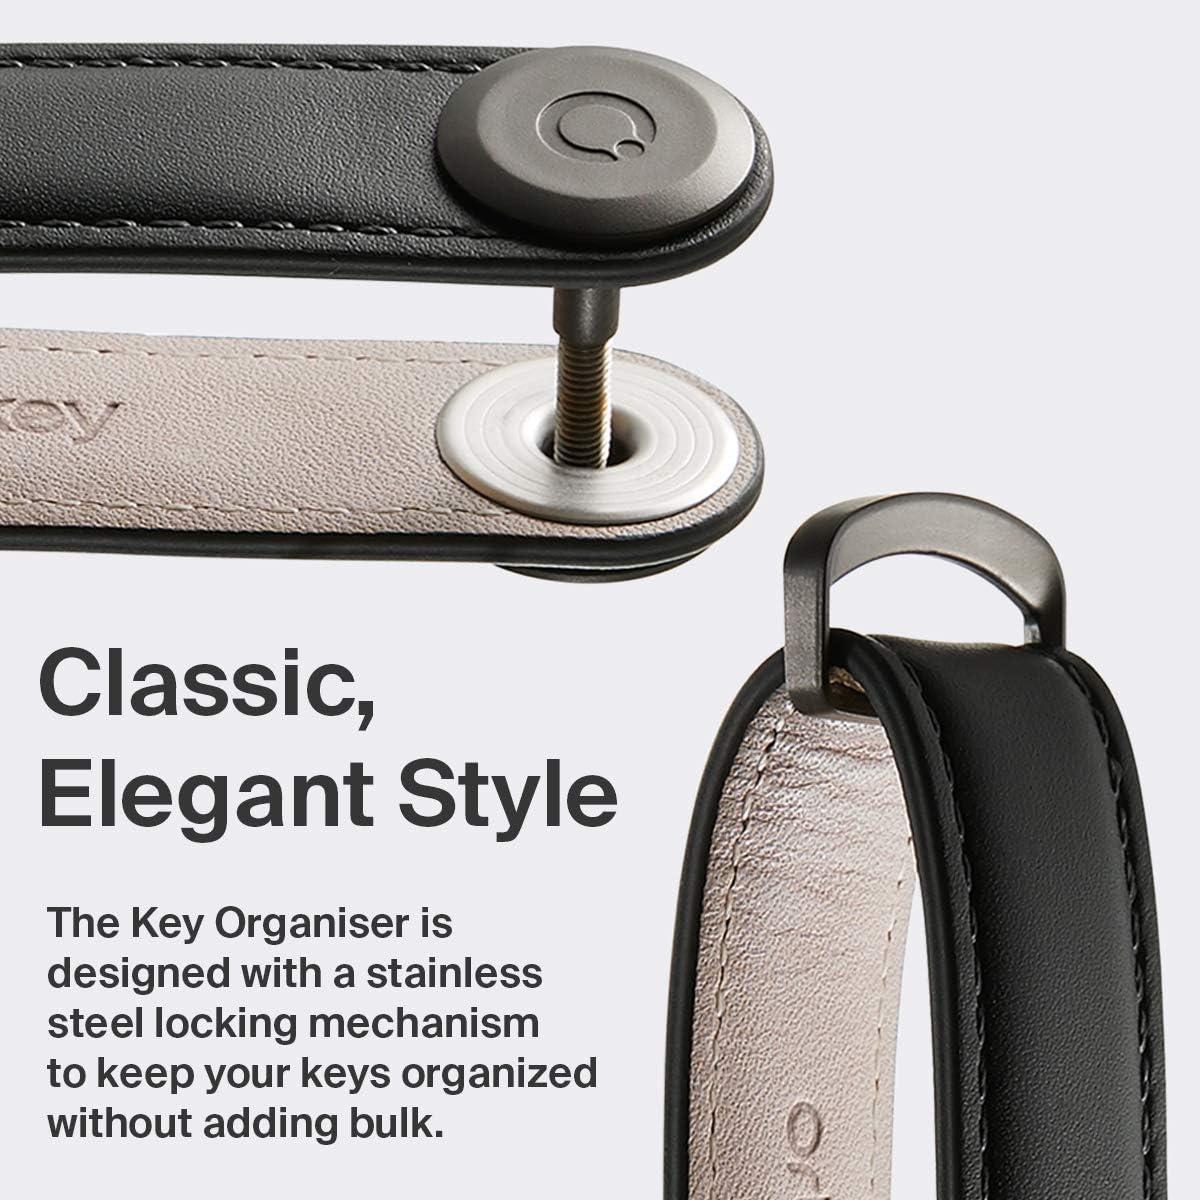 Stainless Steel Locking Mechanism Holds up to 7 Keys, Orbitkey Leather Key Organizer Slim /& Quiet Profile Durable